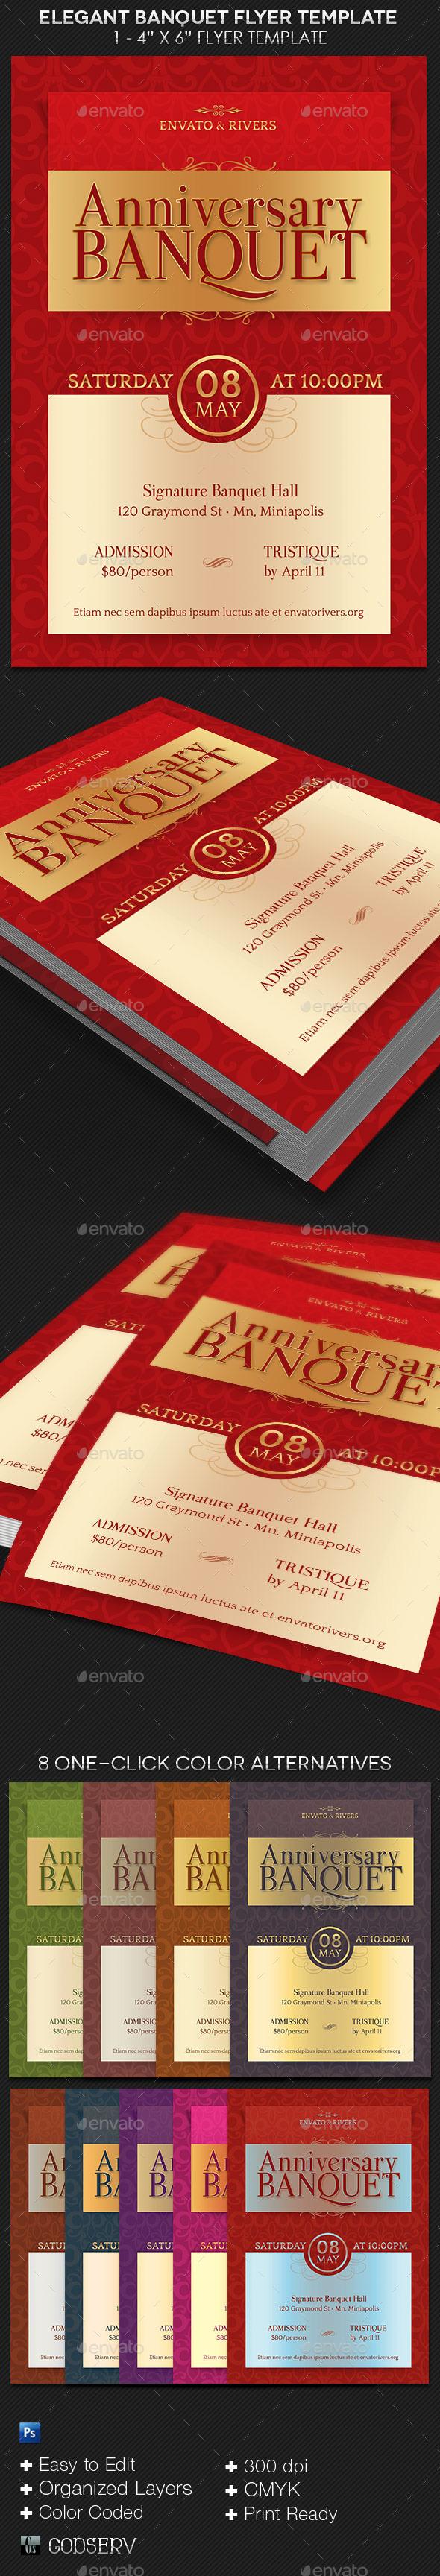 Elegant Banquet Flyer Template | GraphicRiver